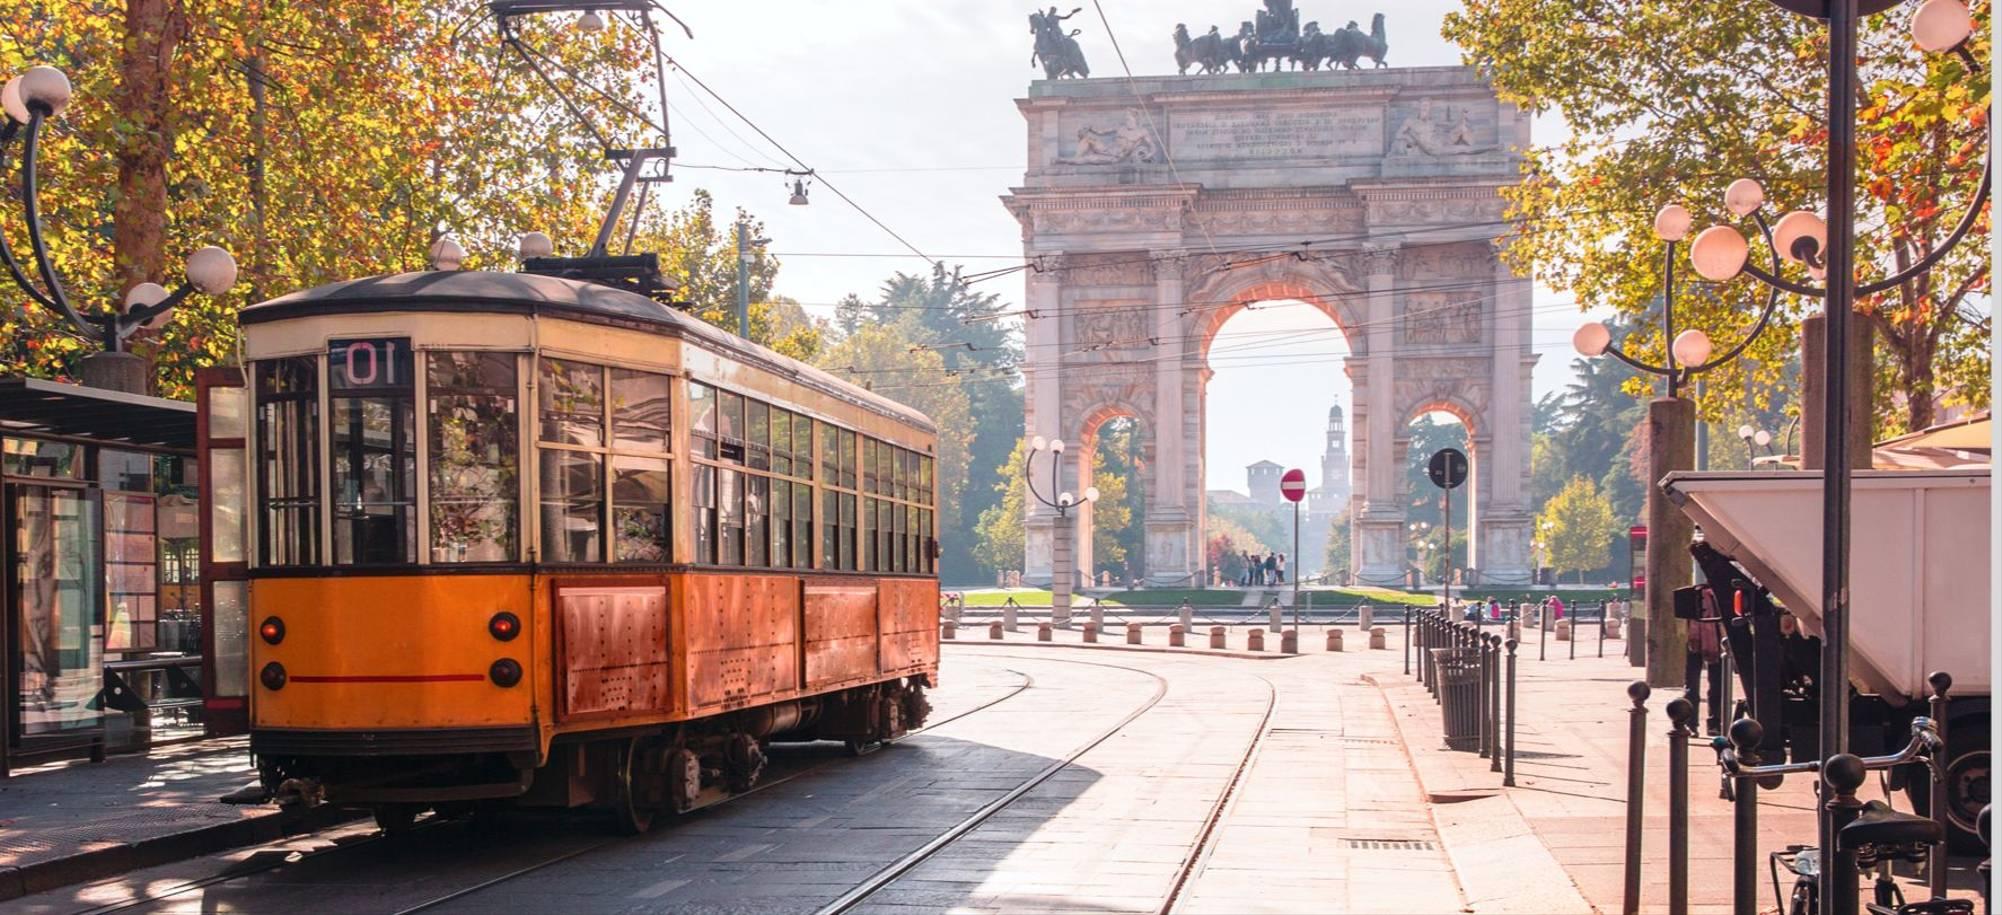 Milan   Tram In Streets   Itinerary Desktop